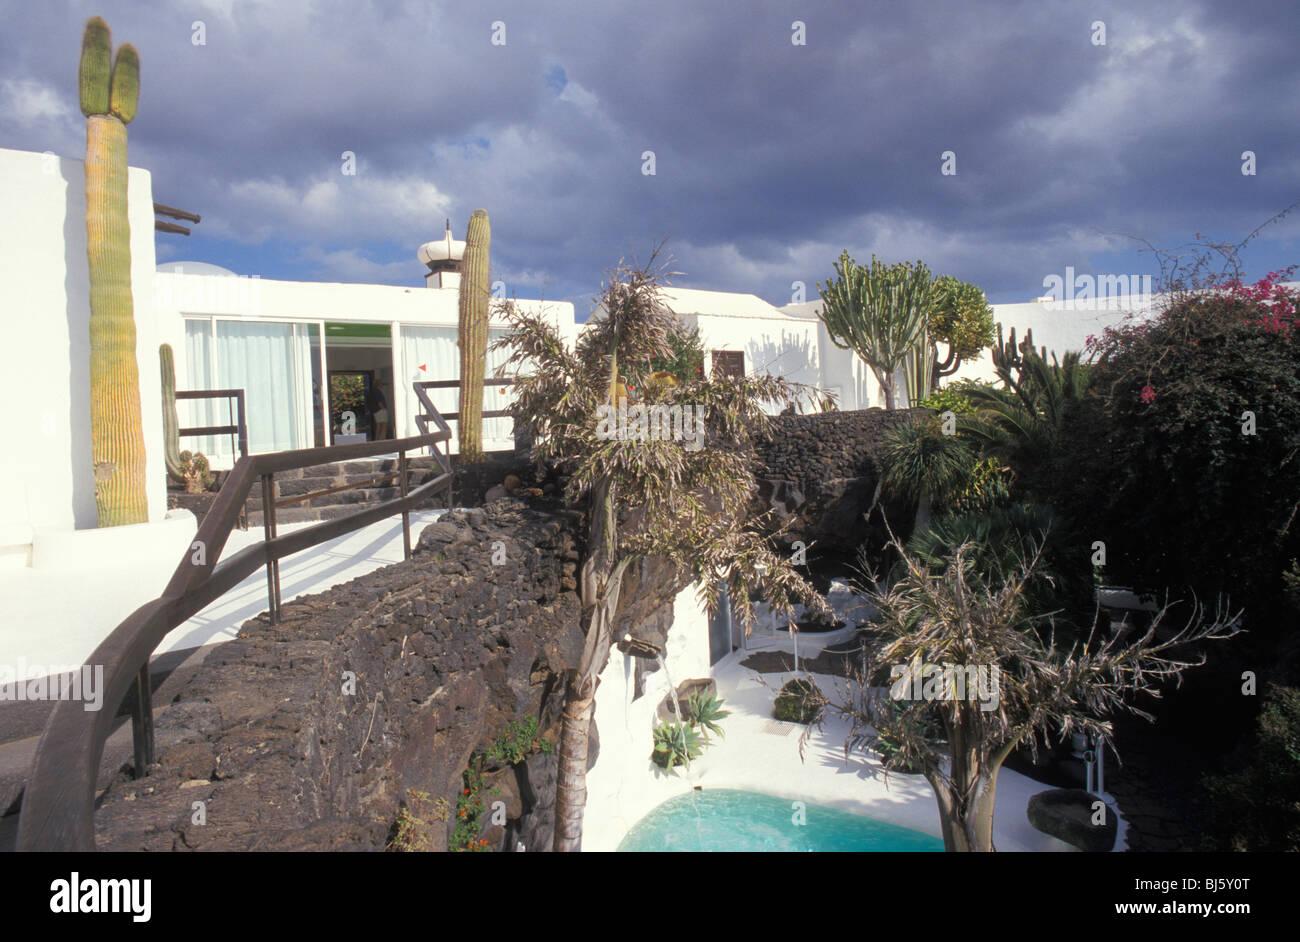 Image gallery manrique architect - Cesar manrique hijos ...